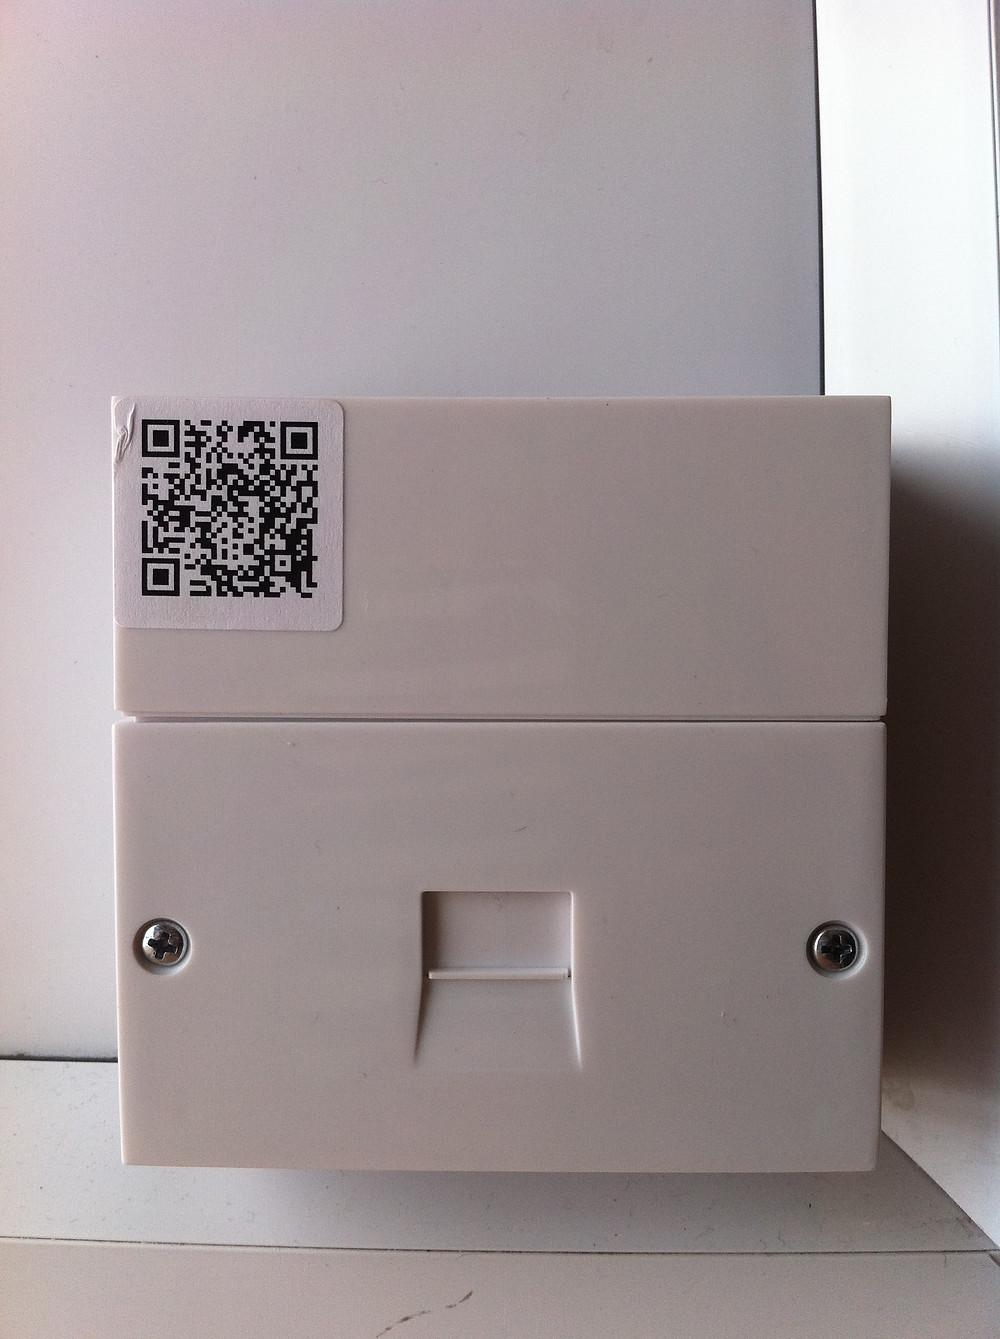 move bt master socket for better wi-fi_littlehampton_west sussex